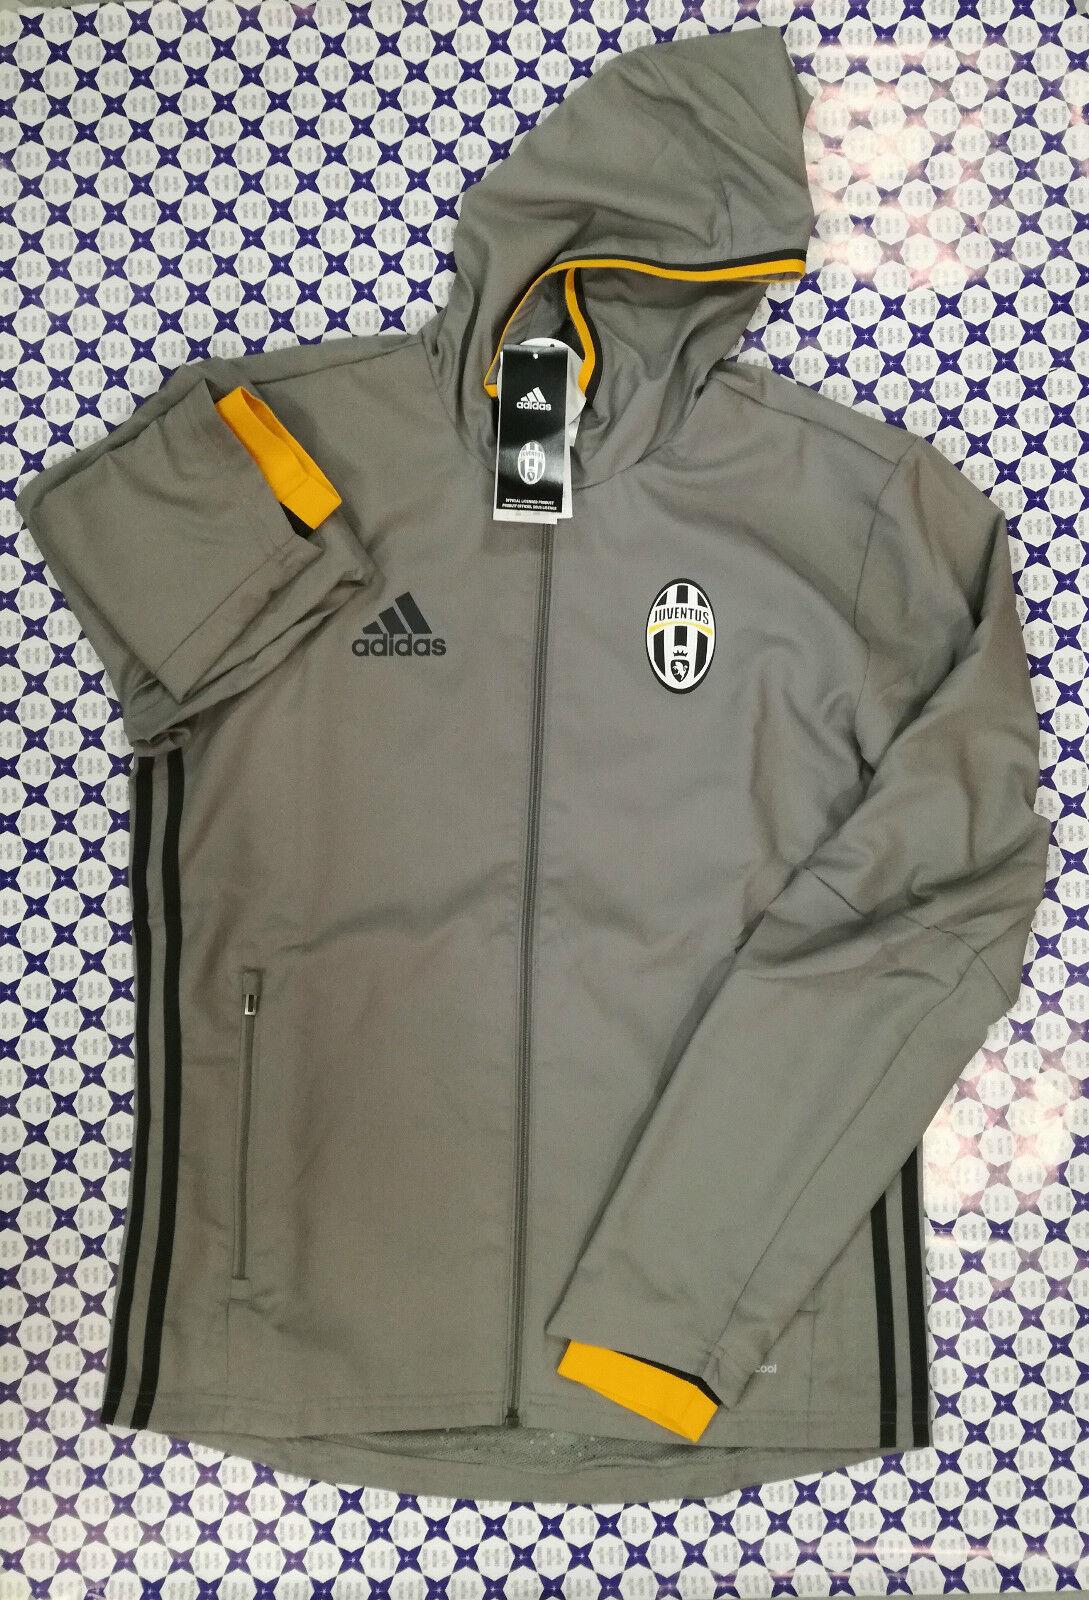 Adidas Giacca Juventus Ufficiale Allenamento Training Climacool 20162017